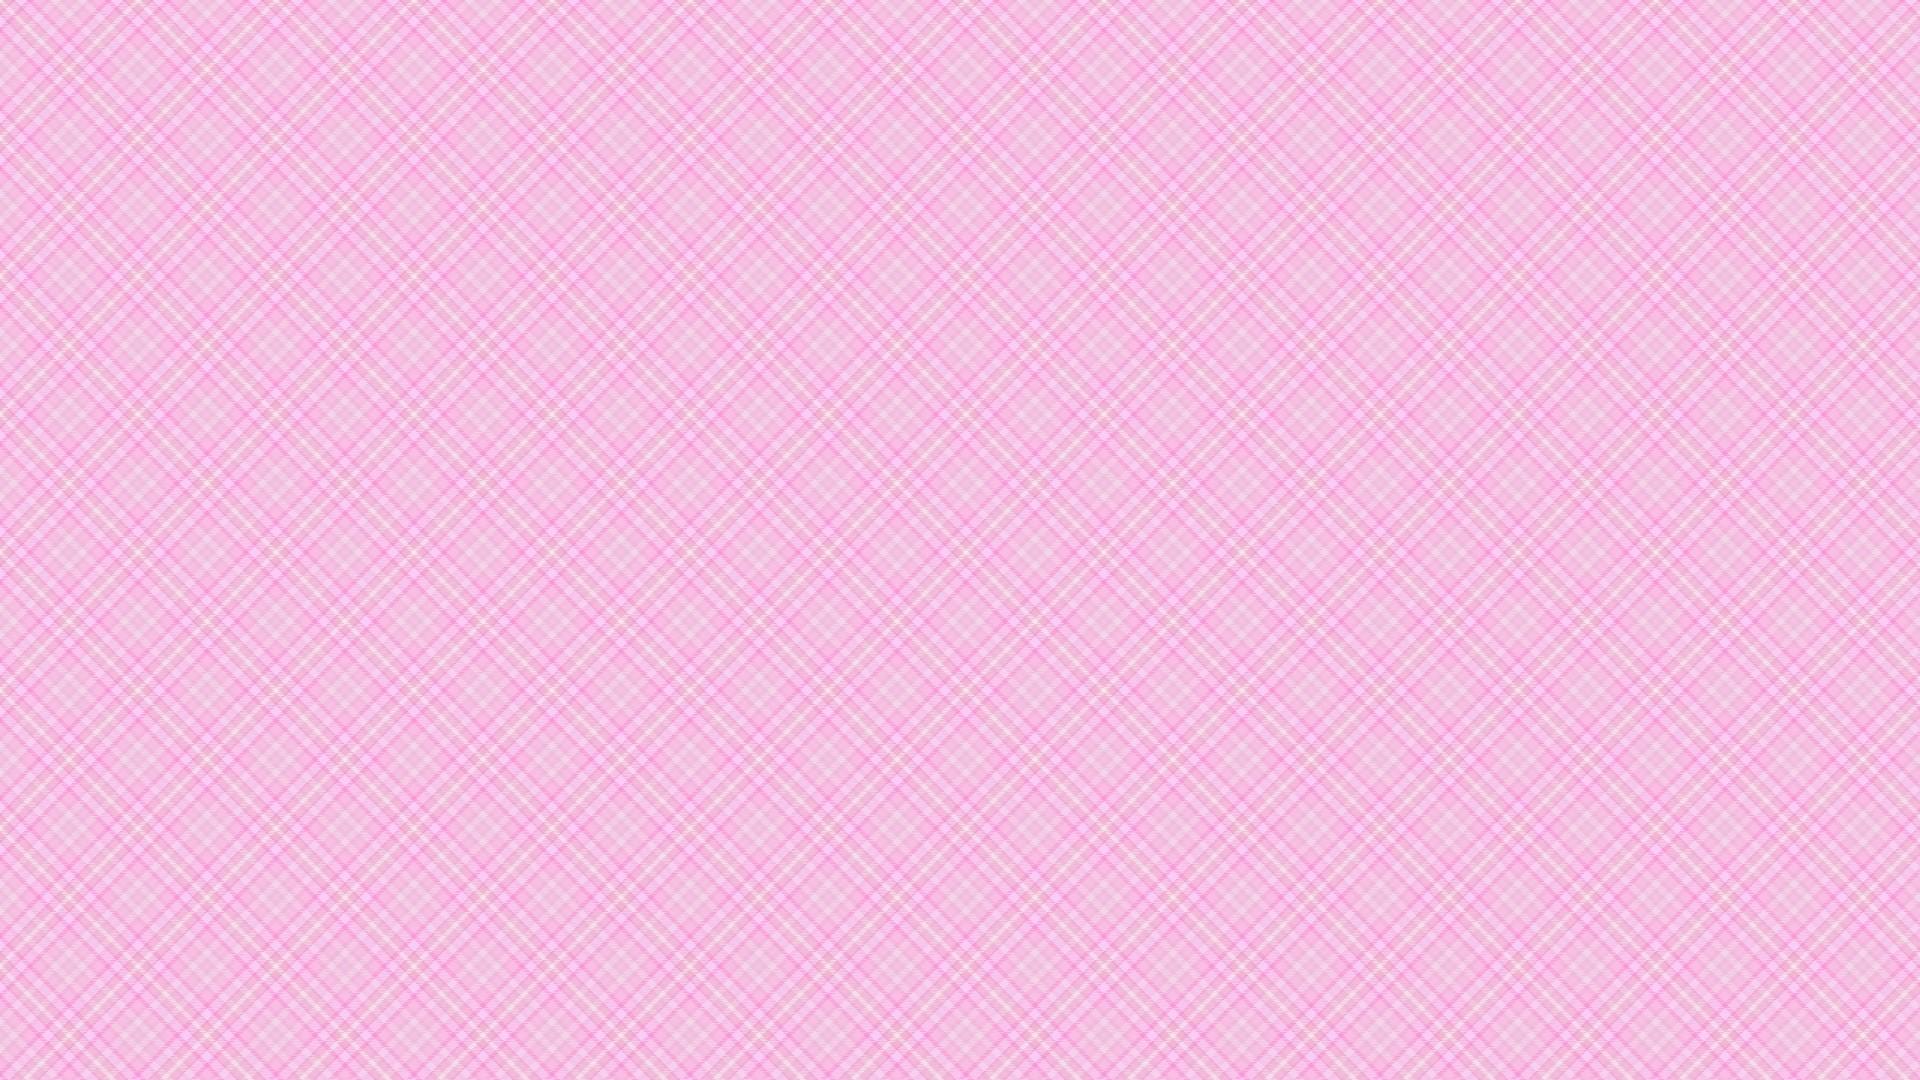 Baby Pink Wallpaper image hd